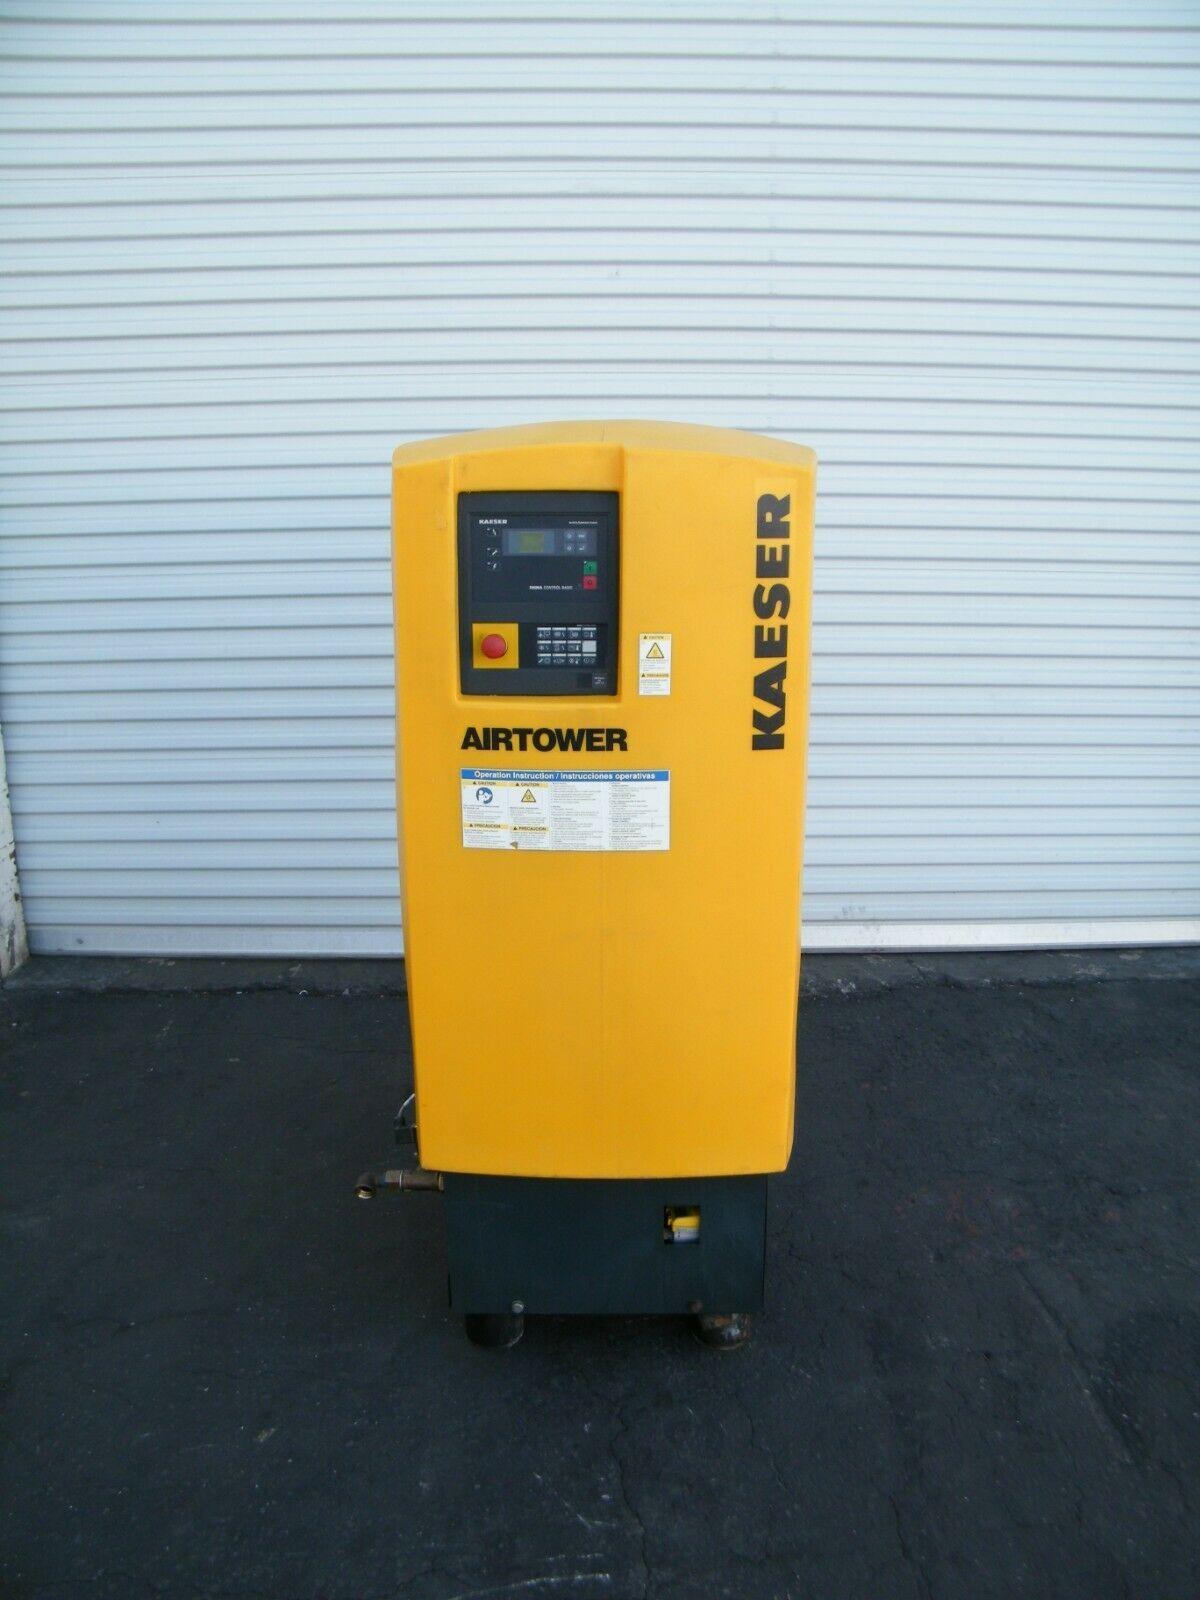 Kaeser Compressor In 2020 Compressor Air Compressor Ingersoll Rand